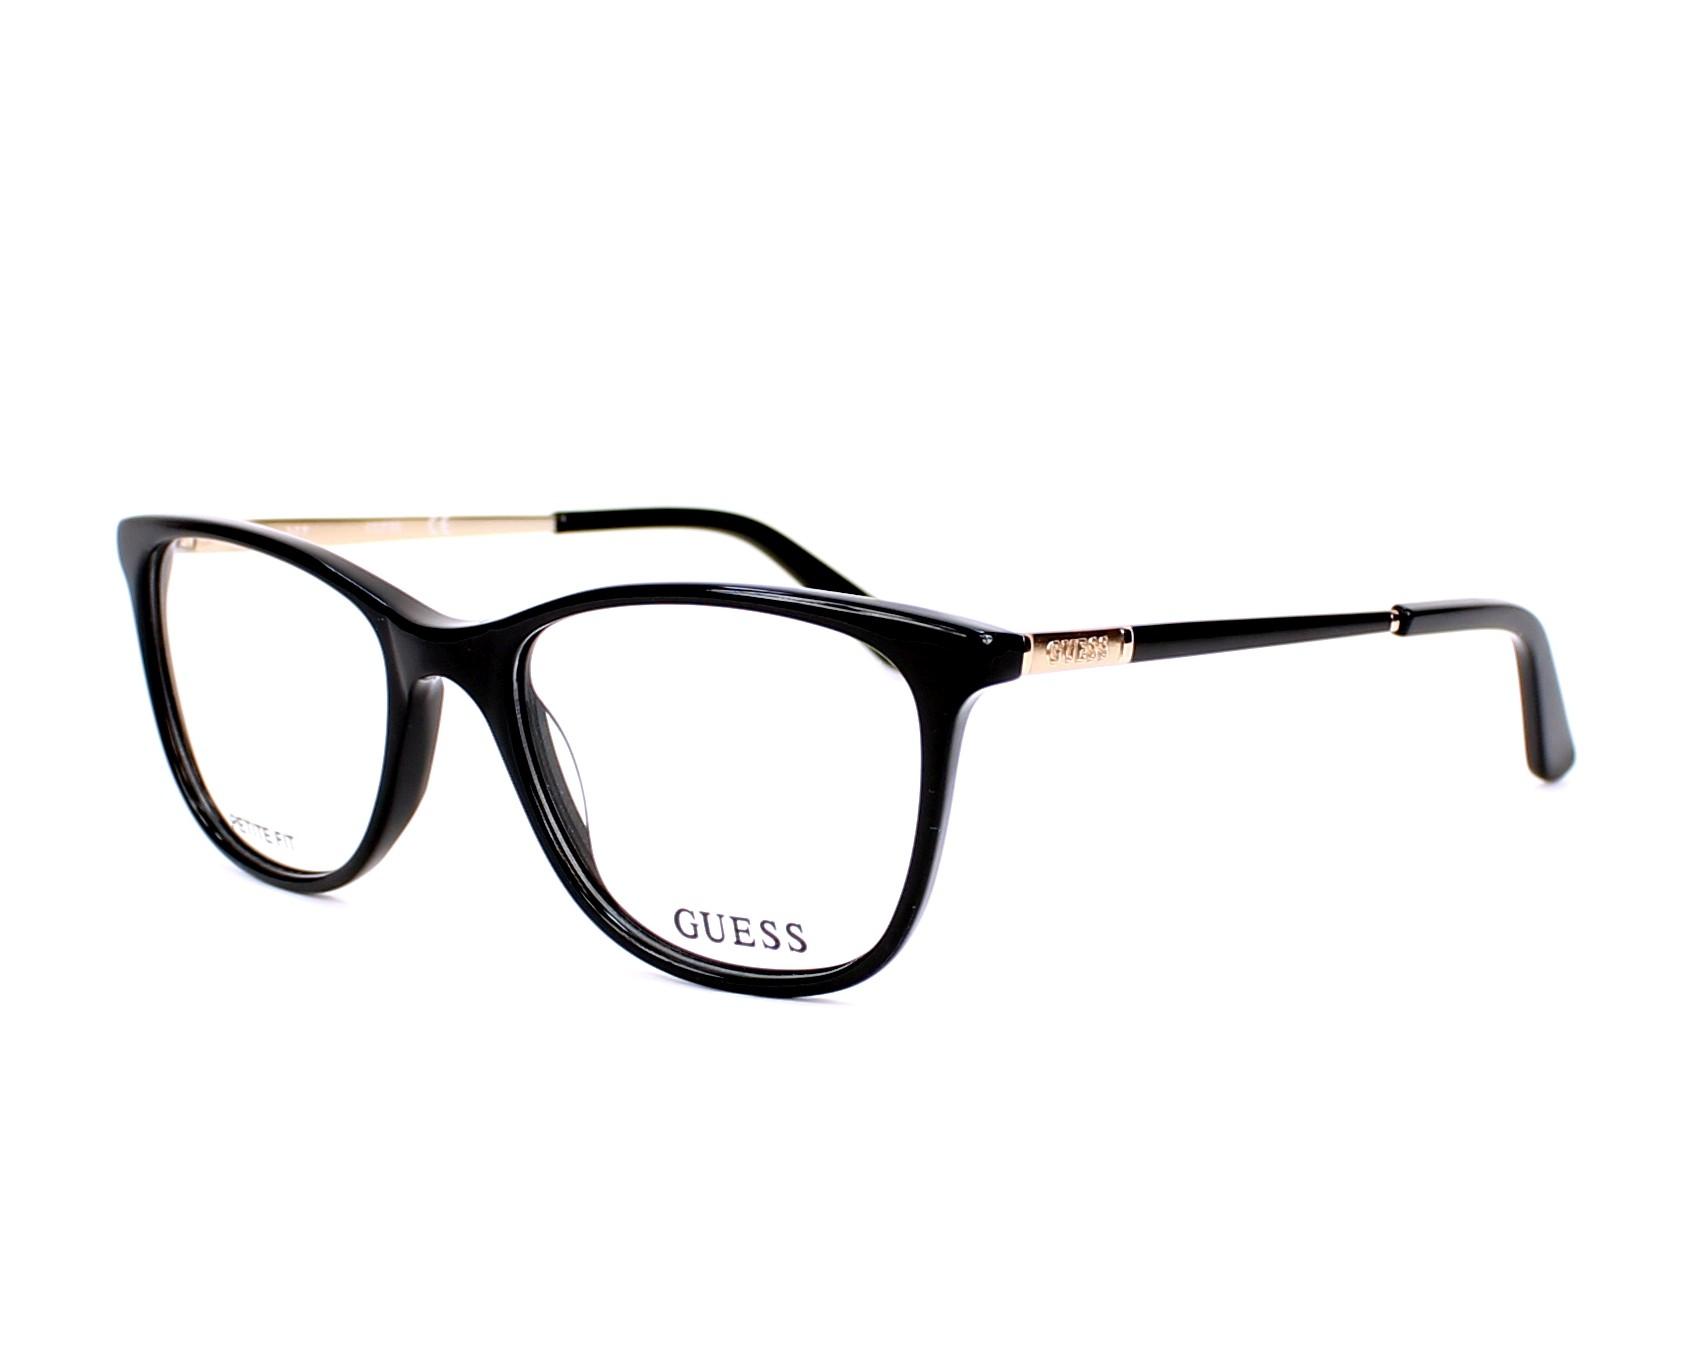 lunettes de vue guess gu2566 005 49 visionet. Black Bedroom Furniture Sets. Home Design Ideas